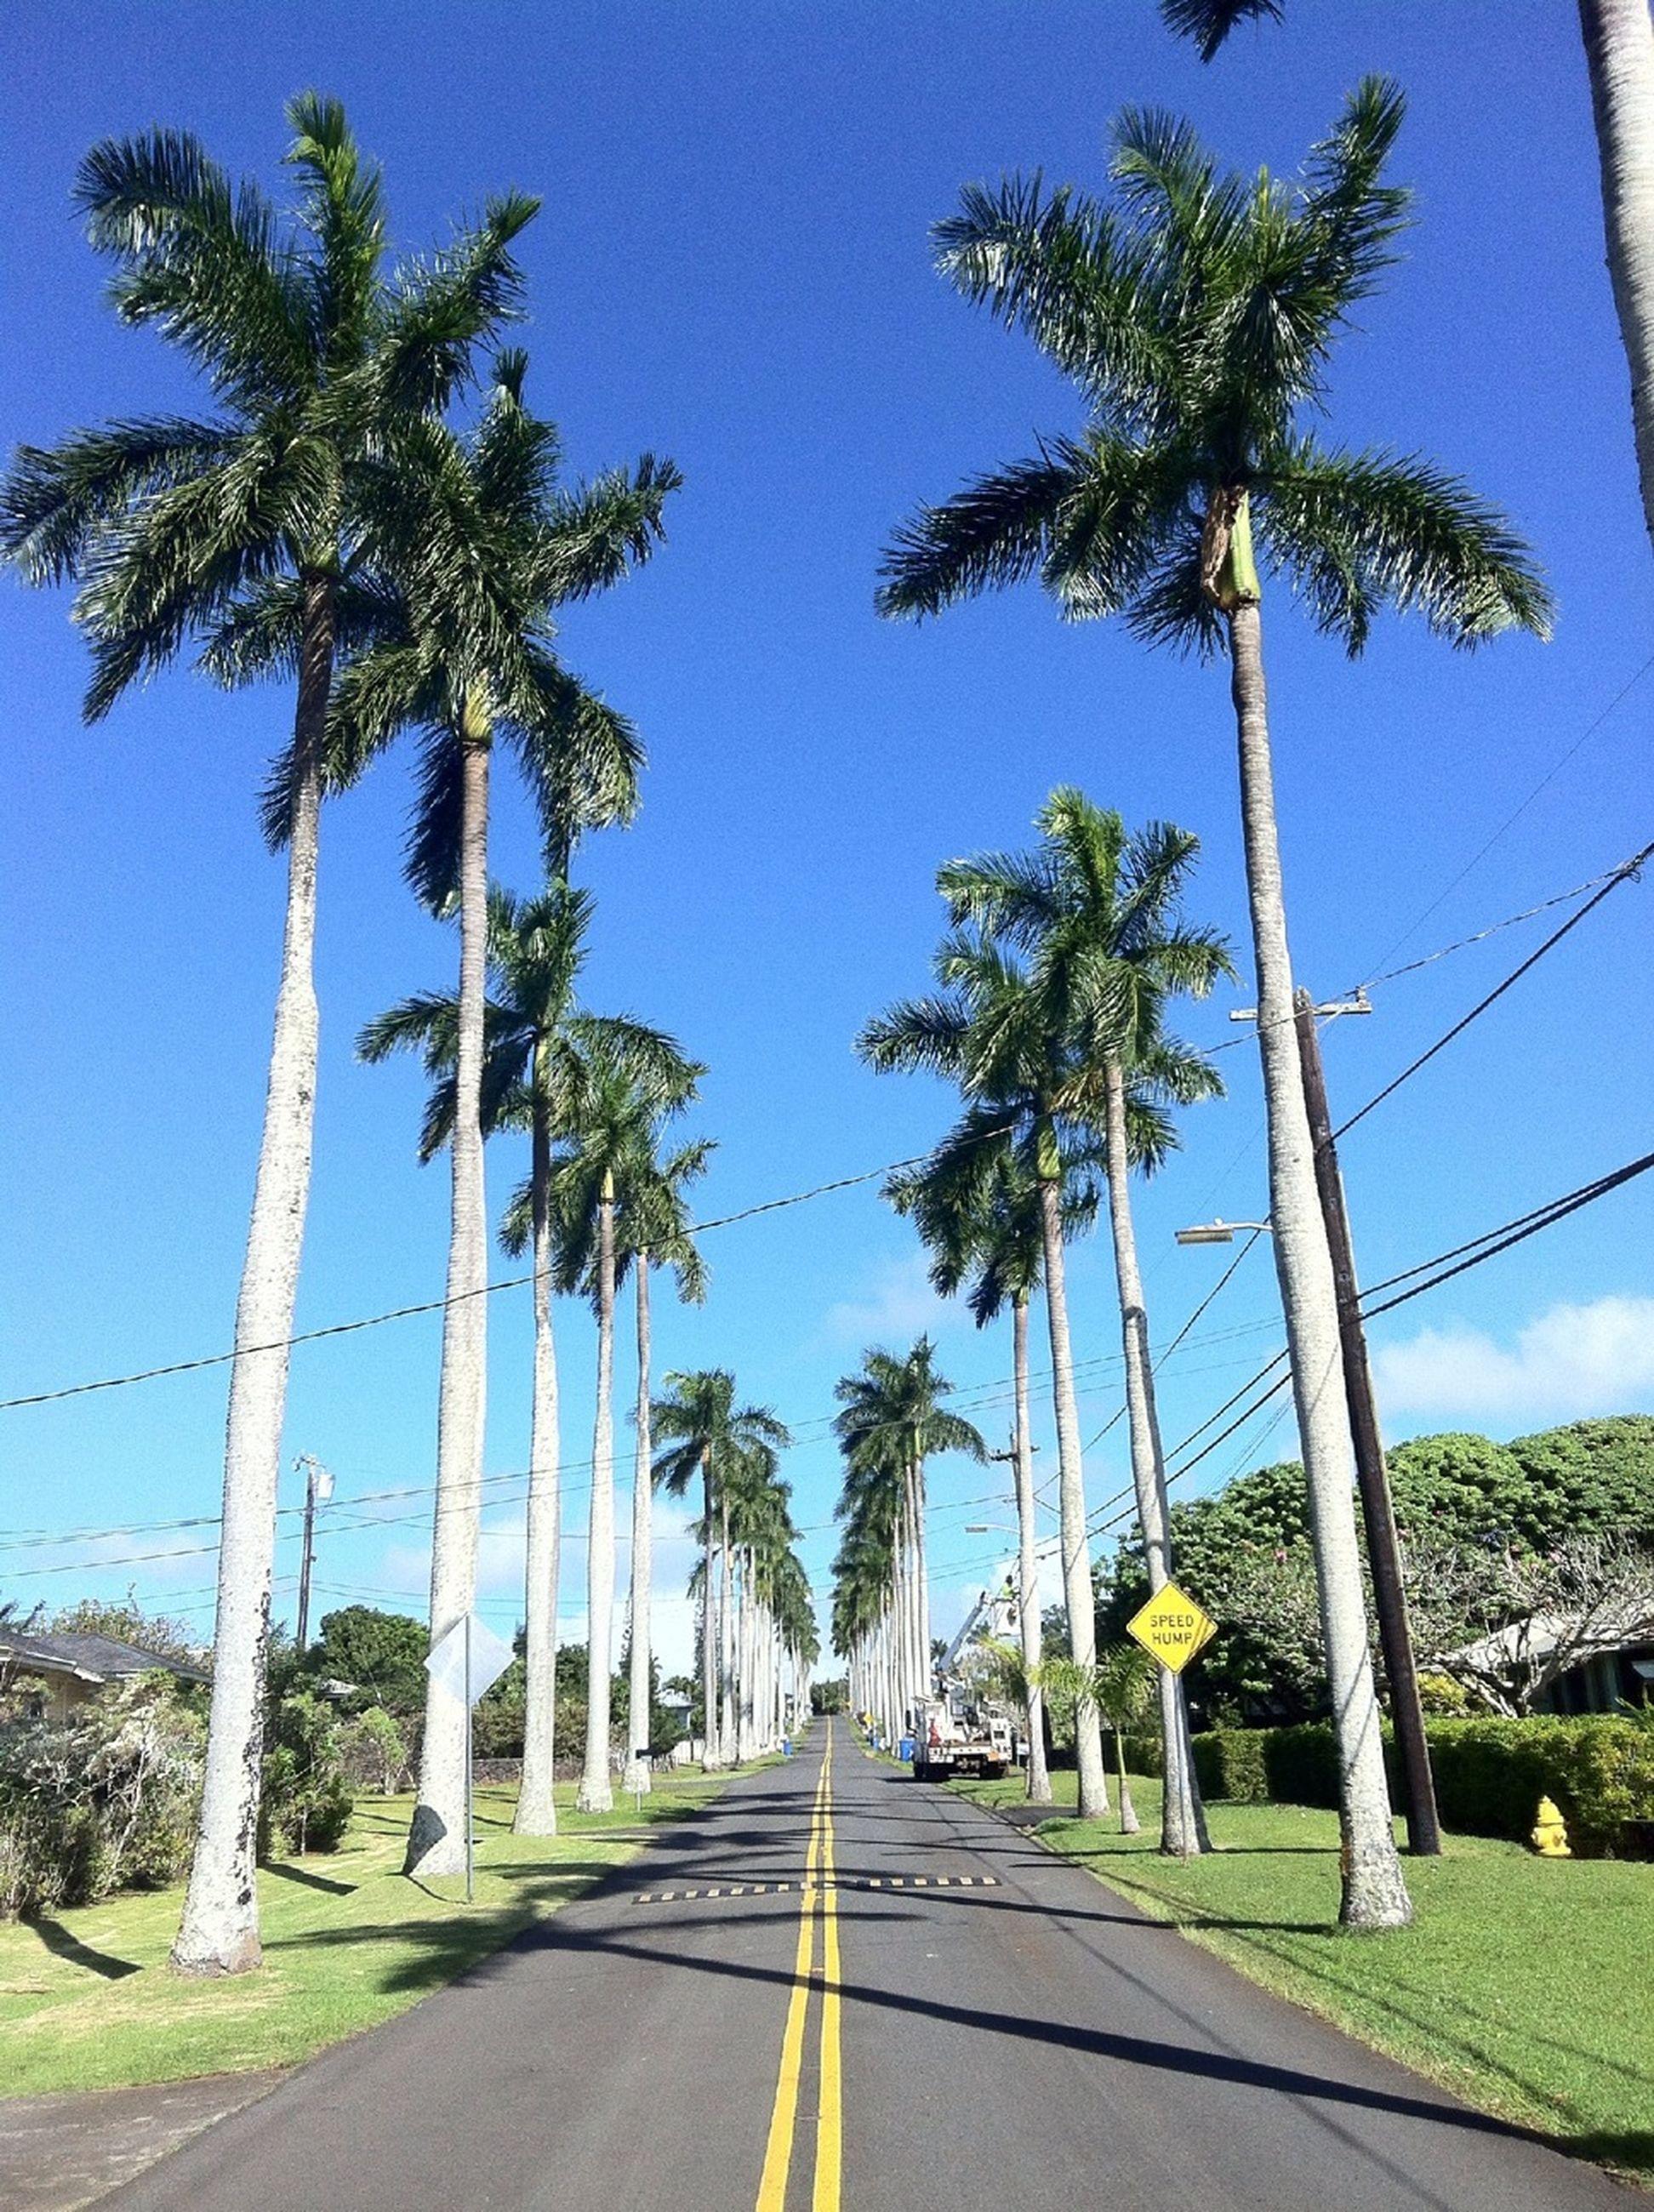 the way forward, tree, palm tree, road, diminishing perspective, transportation, clear sky, blue, vanishing point, treelined, long, empty road, road marking, sky, tree trunk, empty, street, growth, sunlight, day